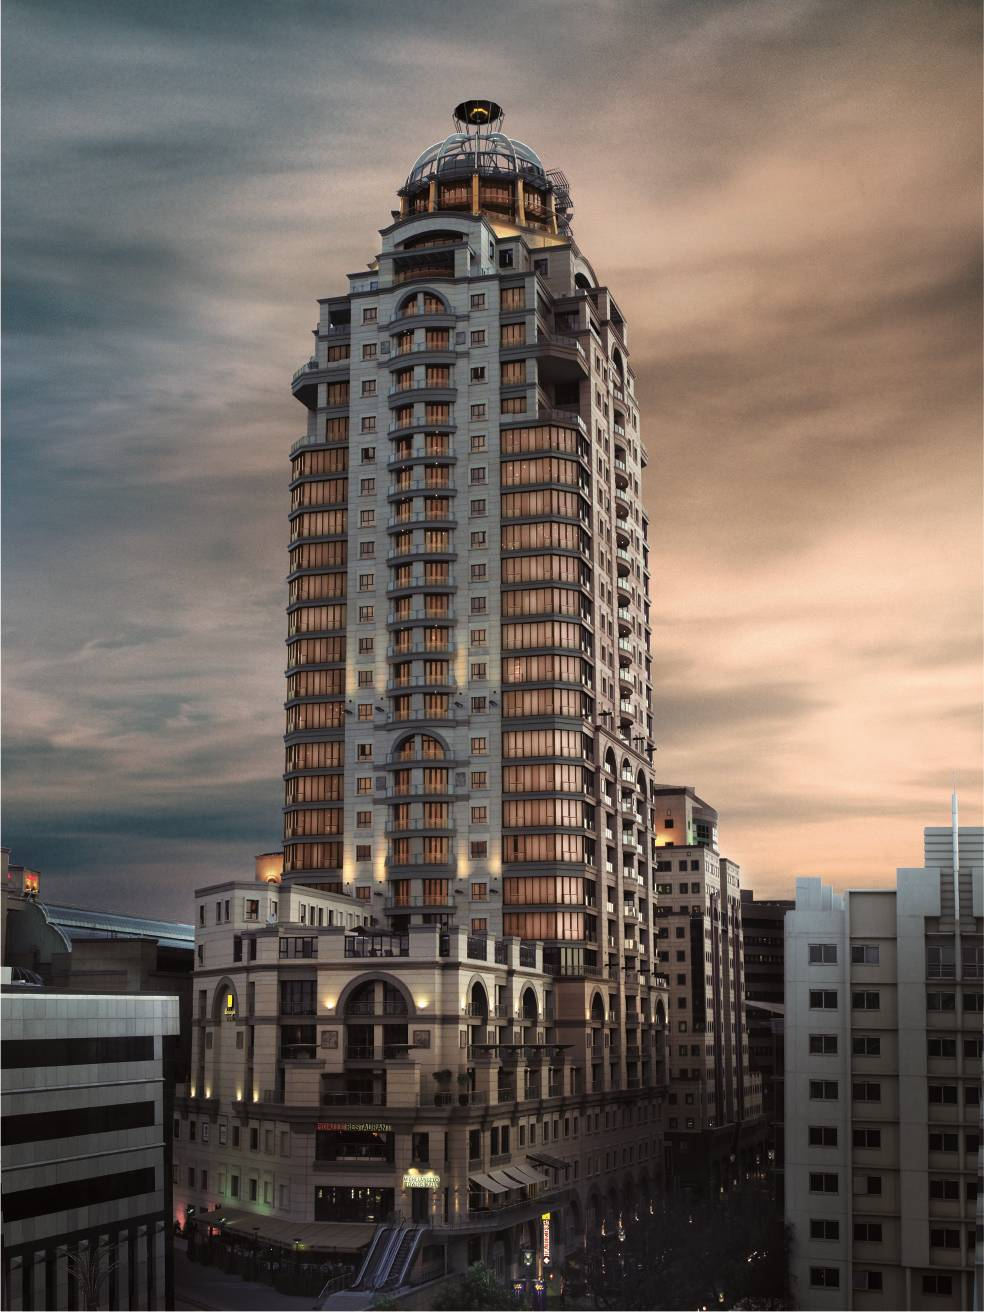 Michelangelo Towers Johannesburg